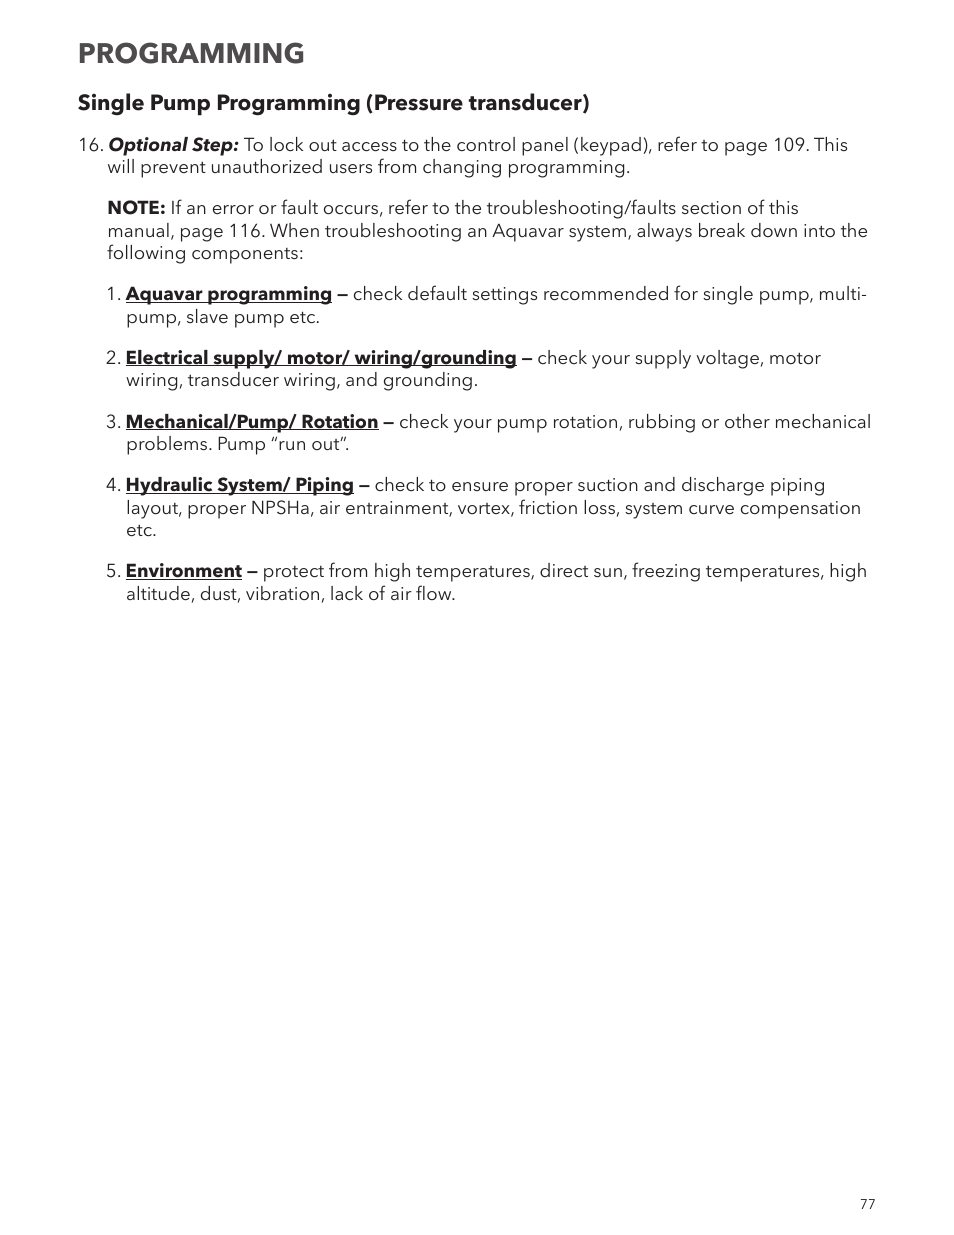 Programming Xylem Im167 R8 Aquavar Cpc Centrifugal Pump Control Piping Layout Around User Manual Page 77 152